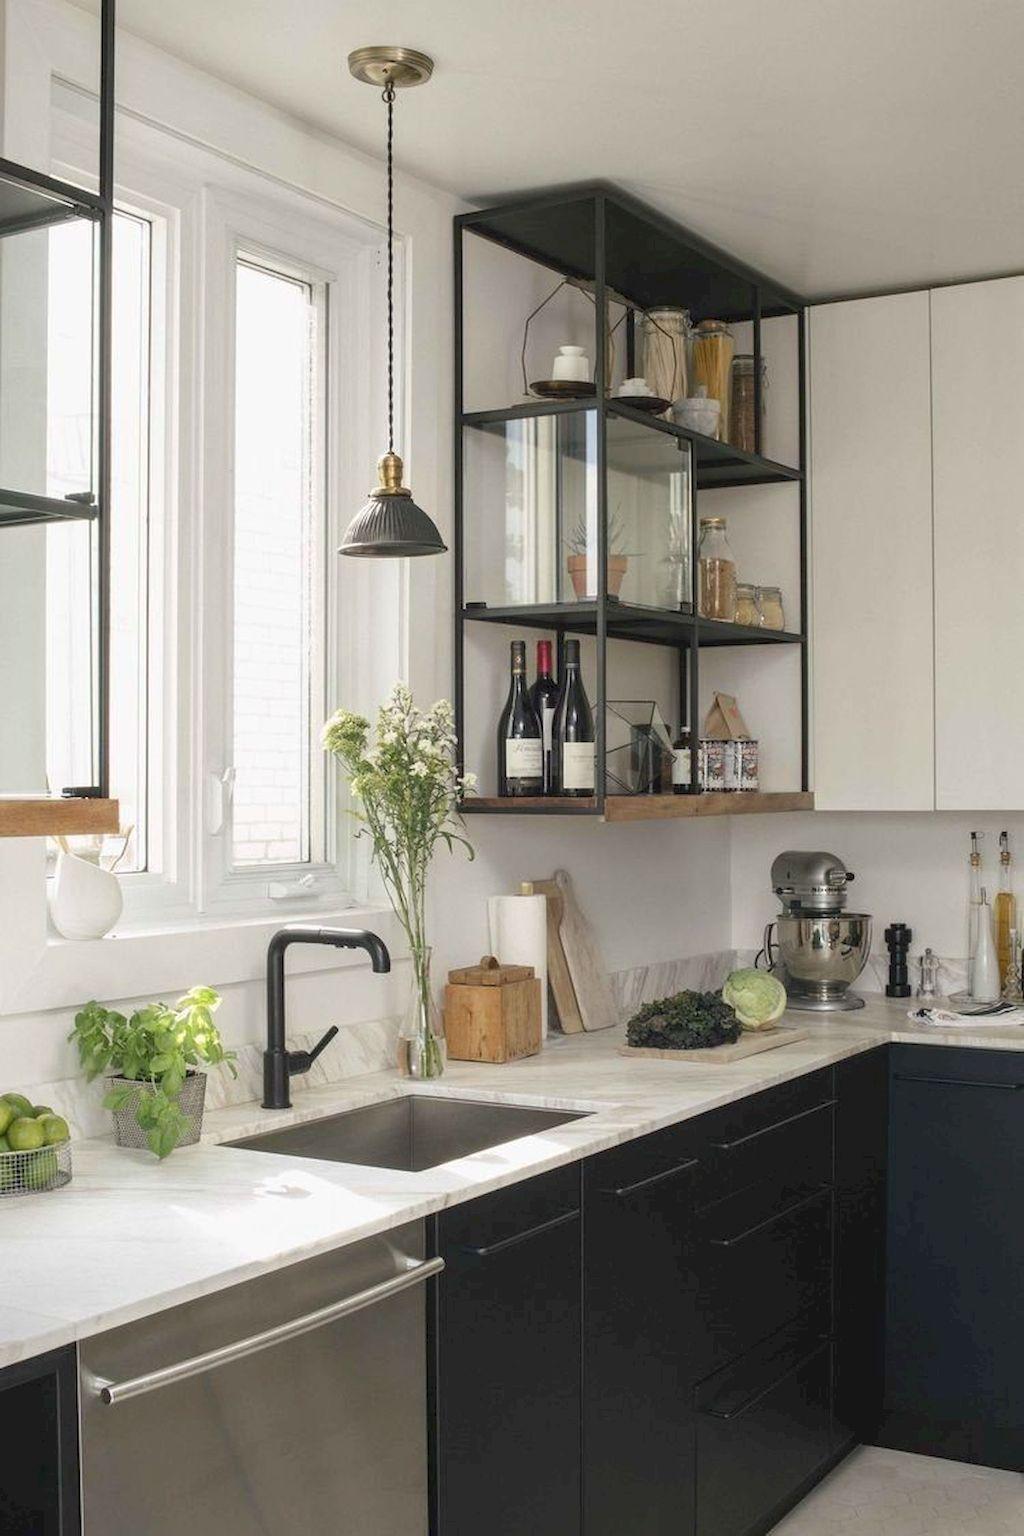 Fine popular small apartment kitchen ideas decor pinterest